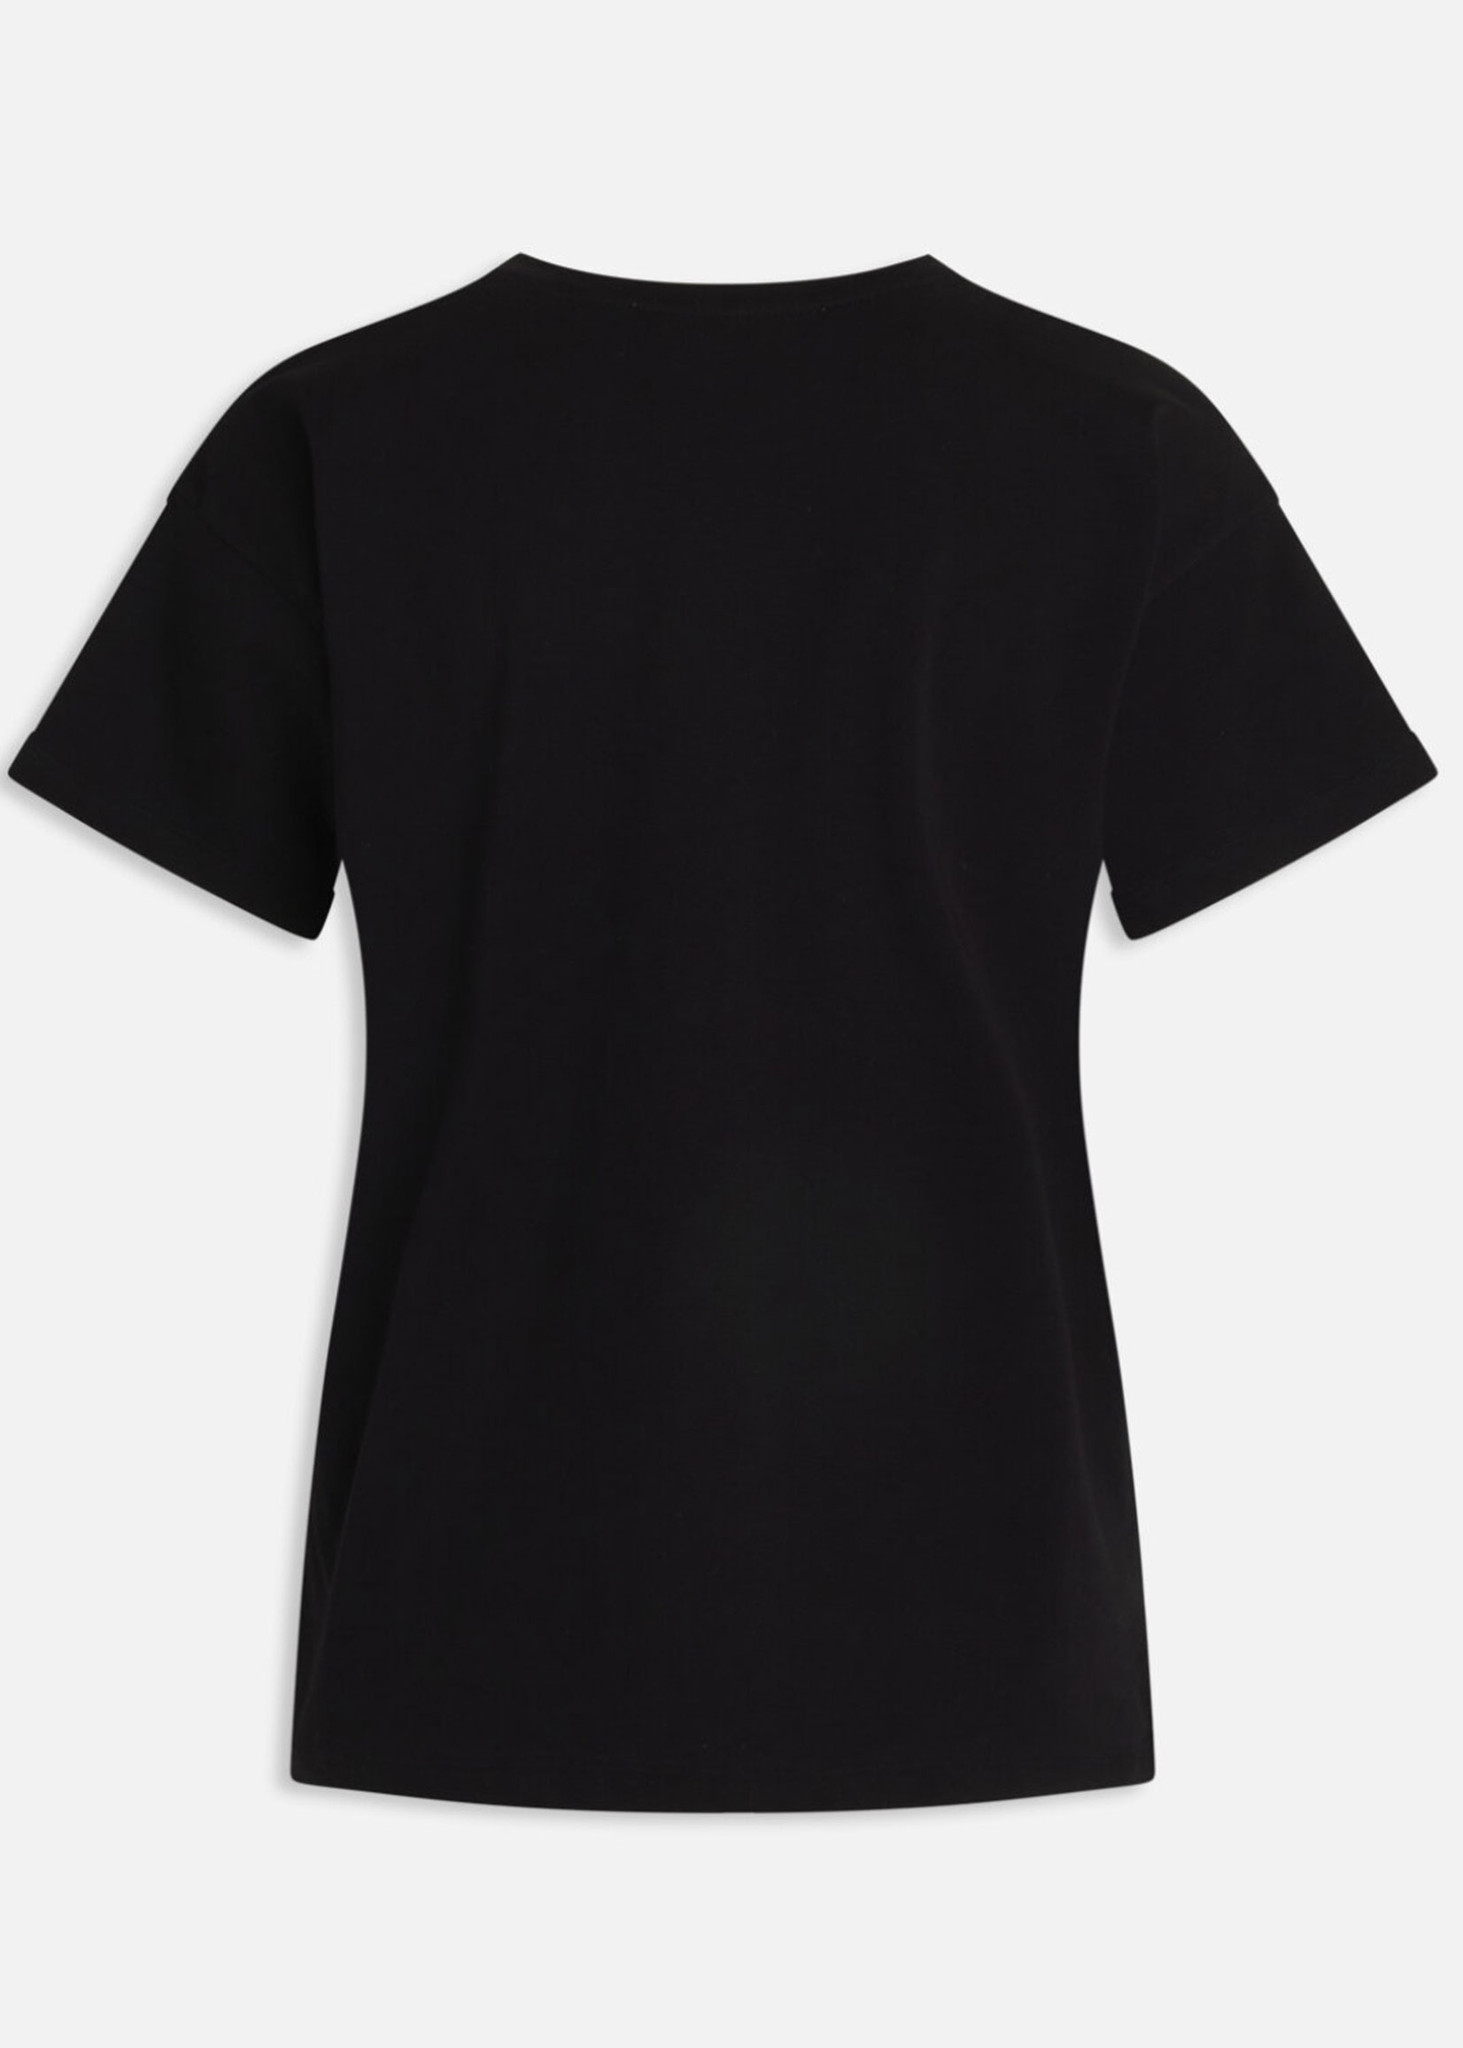 Black Leopard Pein Shirt-2